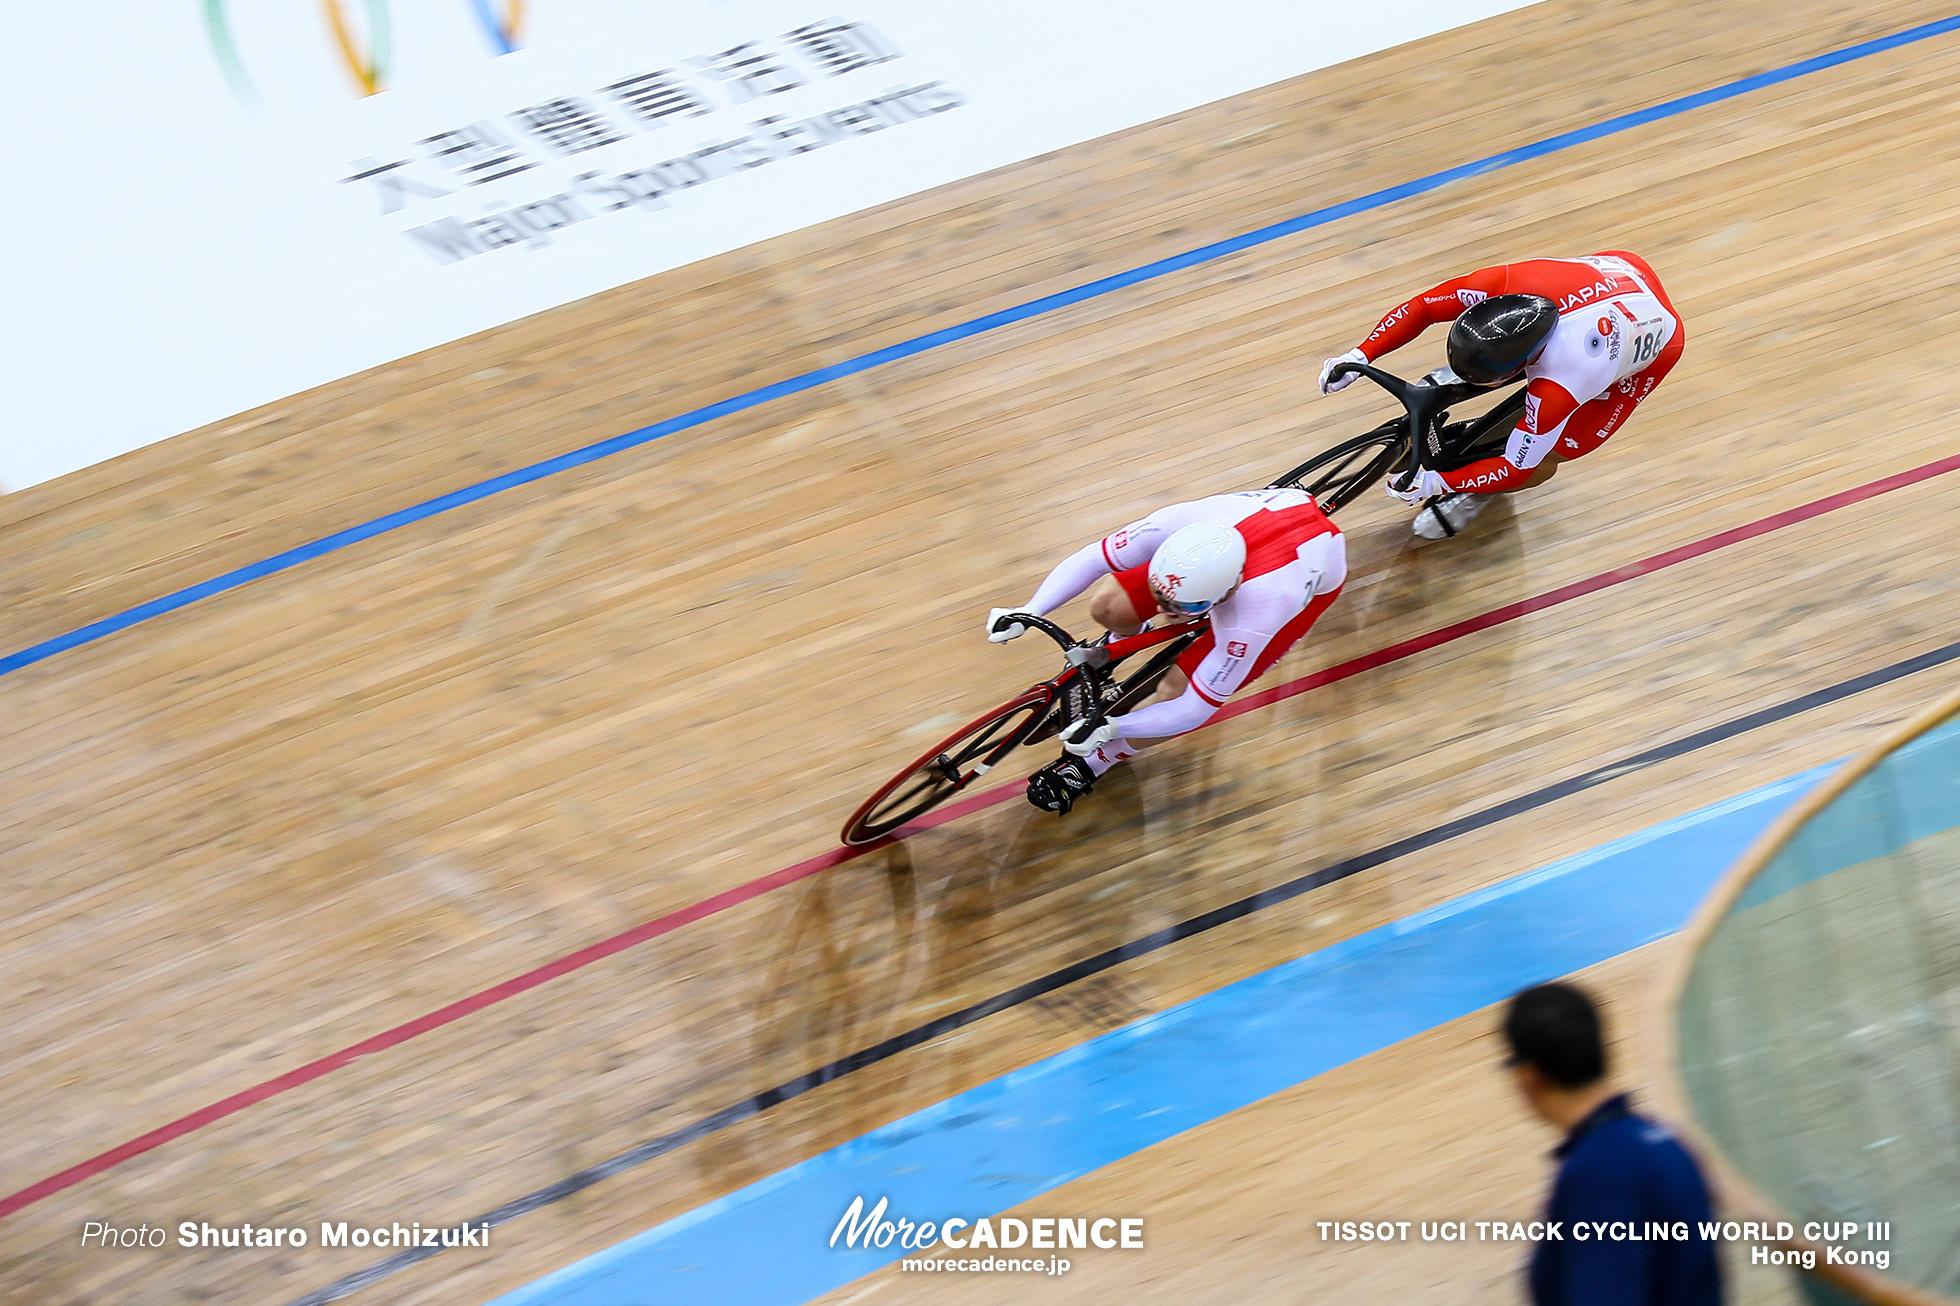 Final / Men's Sprint / TISSOT UCI TRACK CYCLING WORLD CUP III, Hong Kong